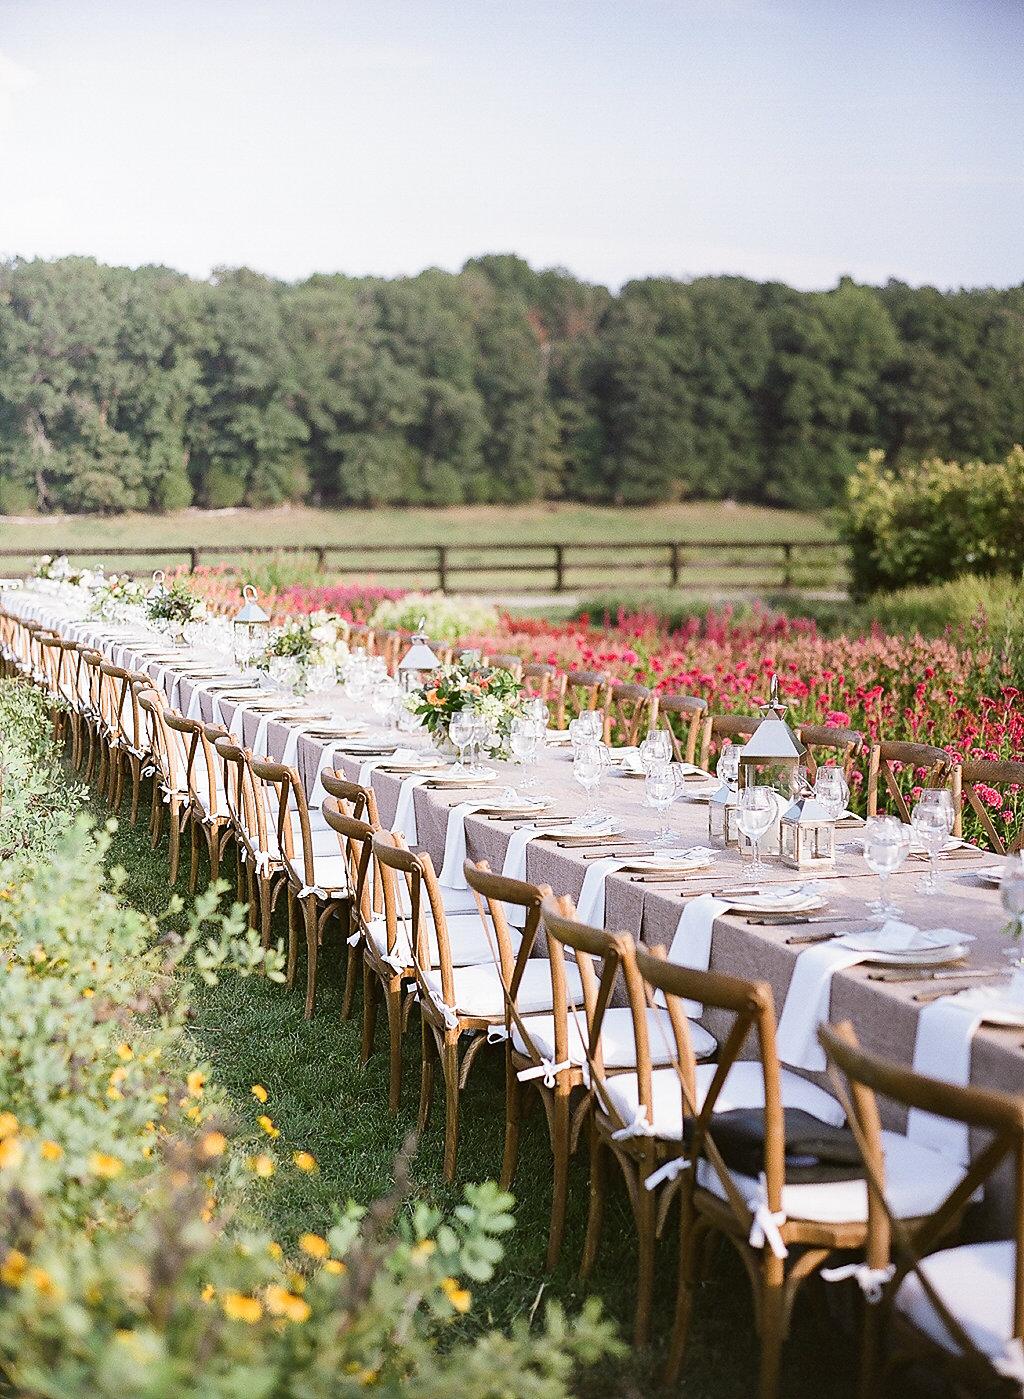 Field_to_Vase_Dinner_Kristen_Lynne_Photography-74